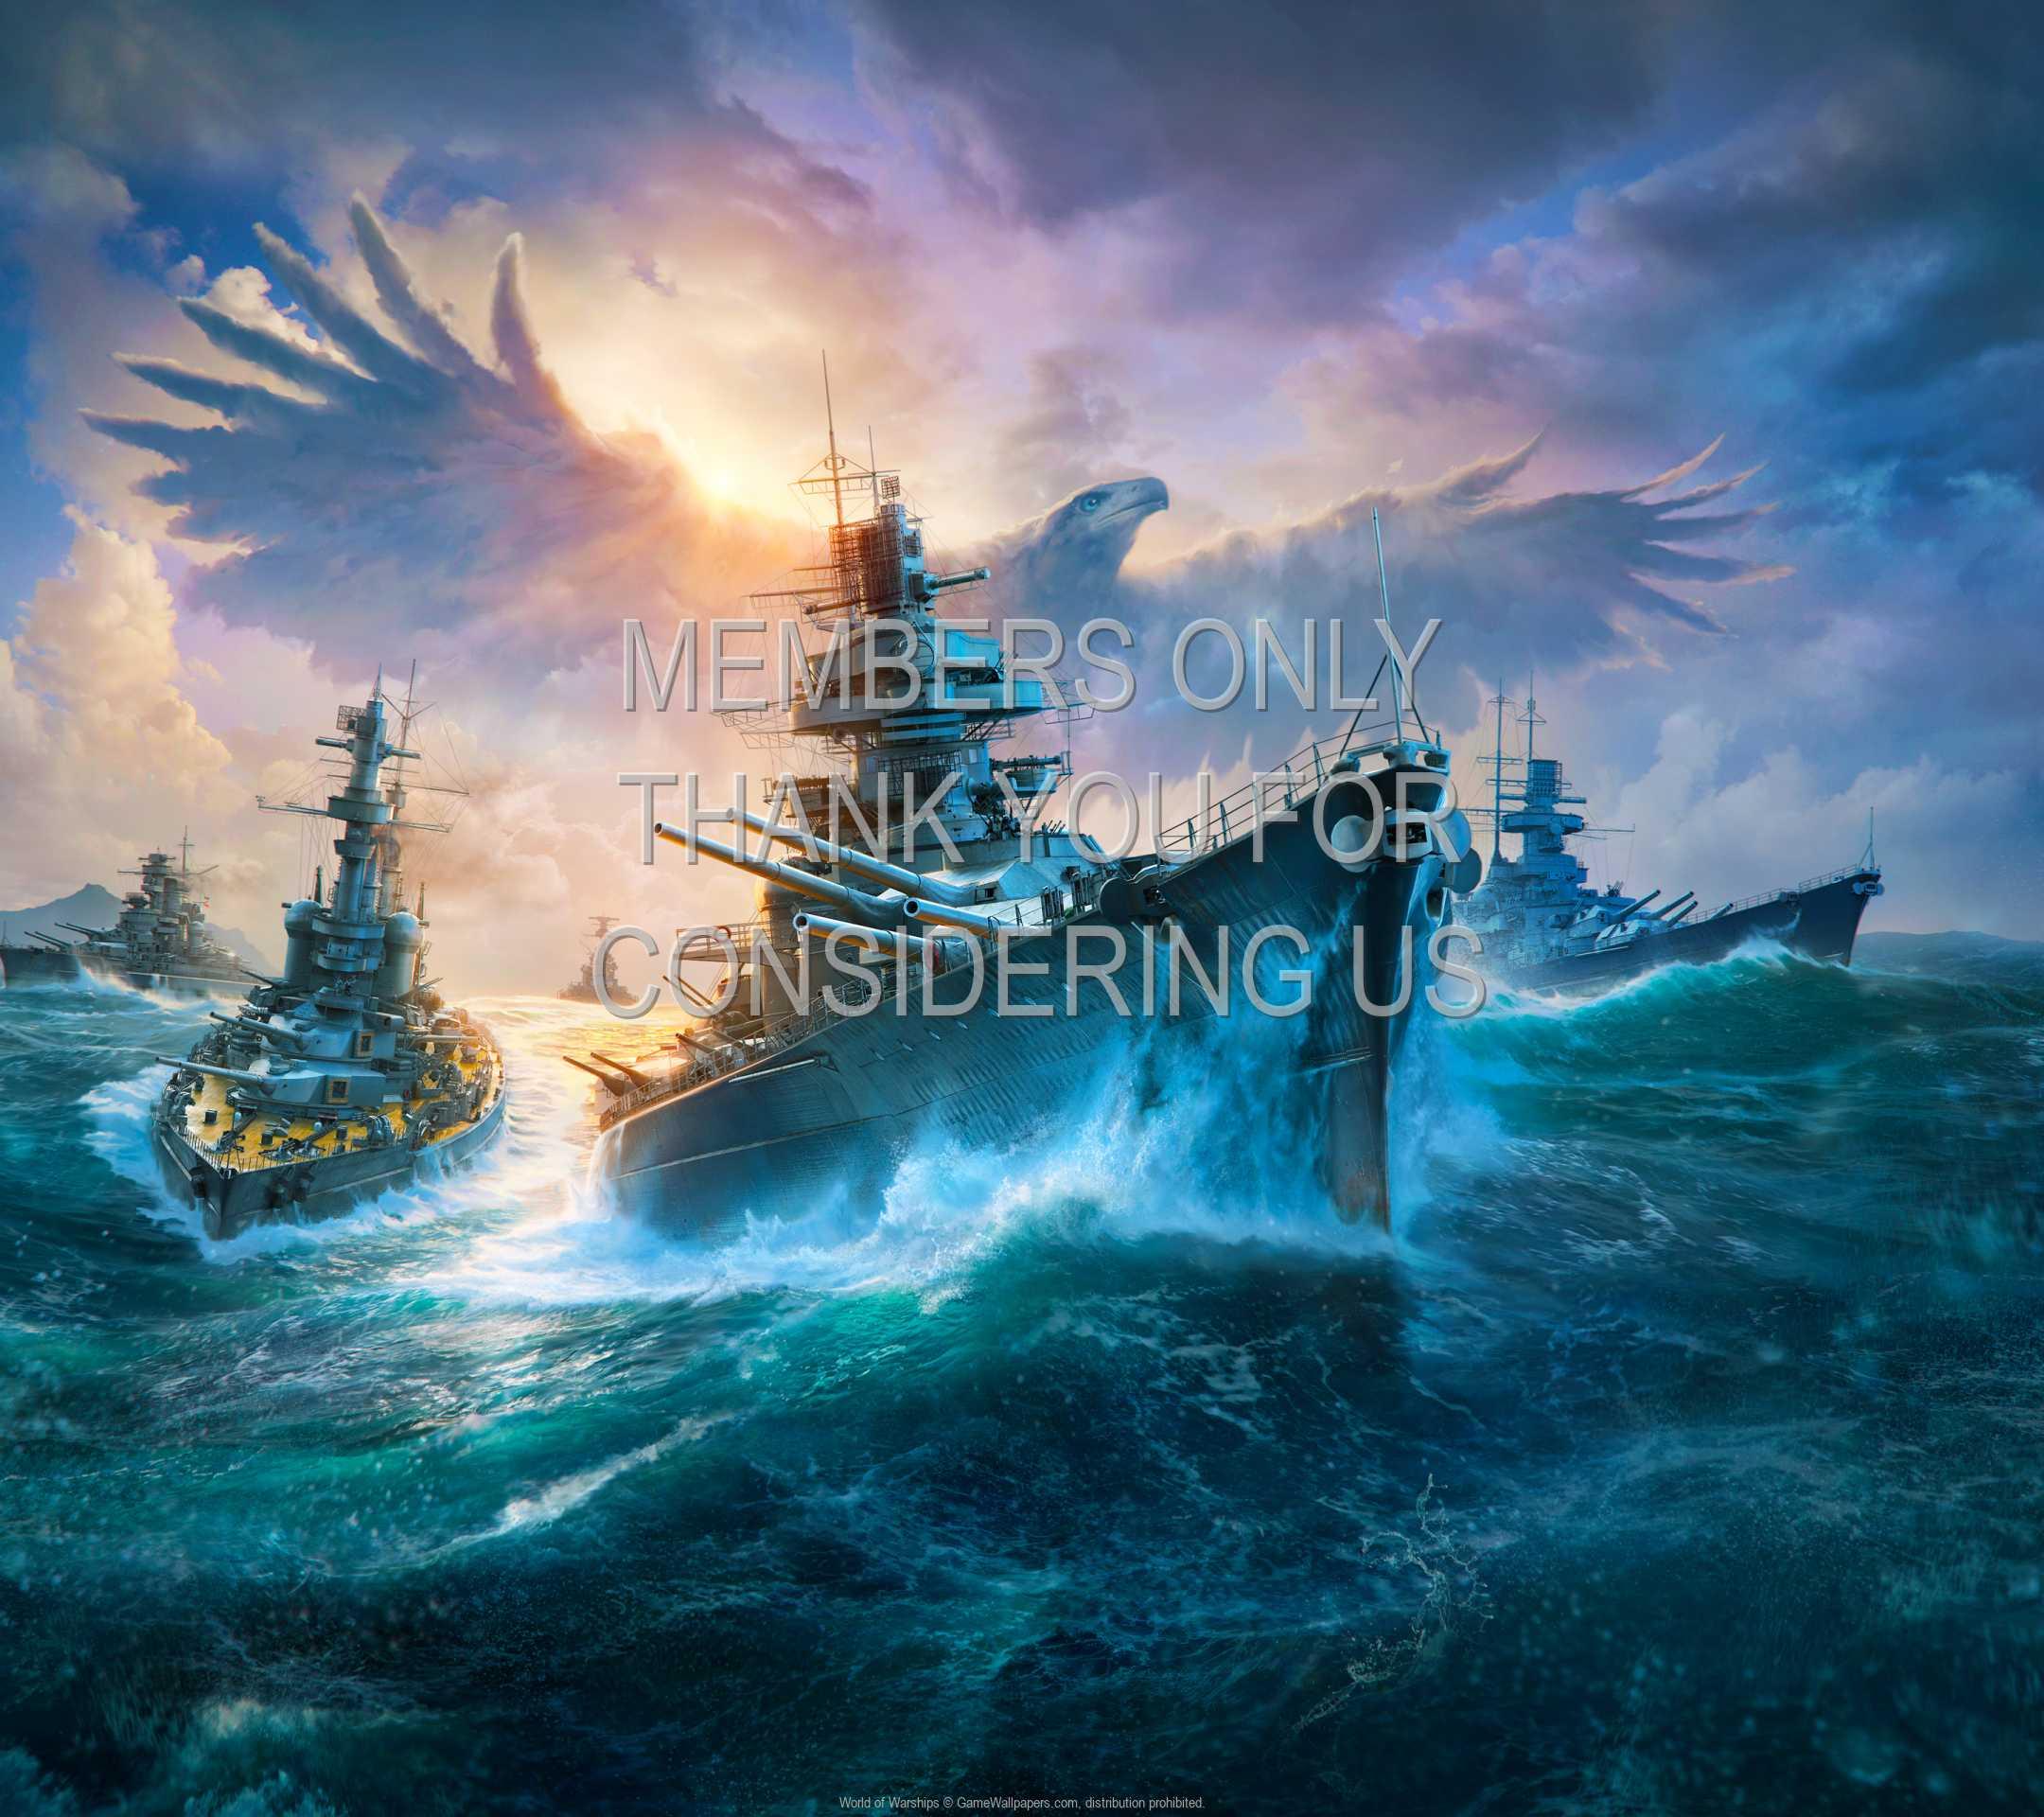 World of Warships 1080p Horizontal Mobile wallpaper or background 18